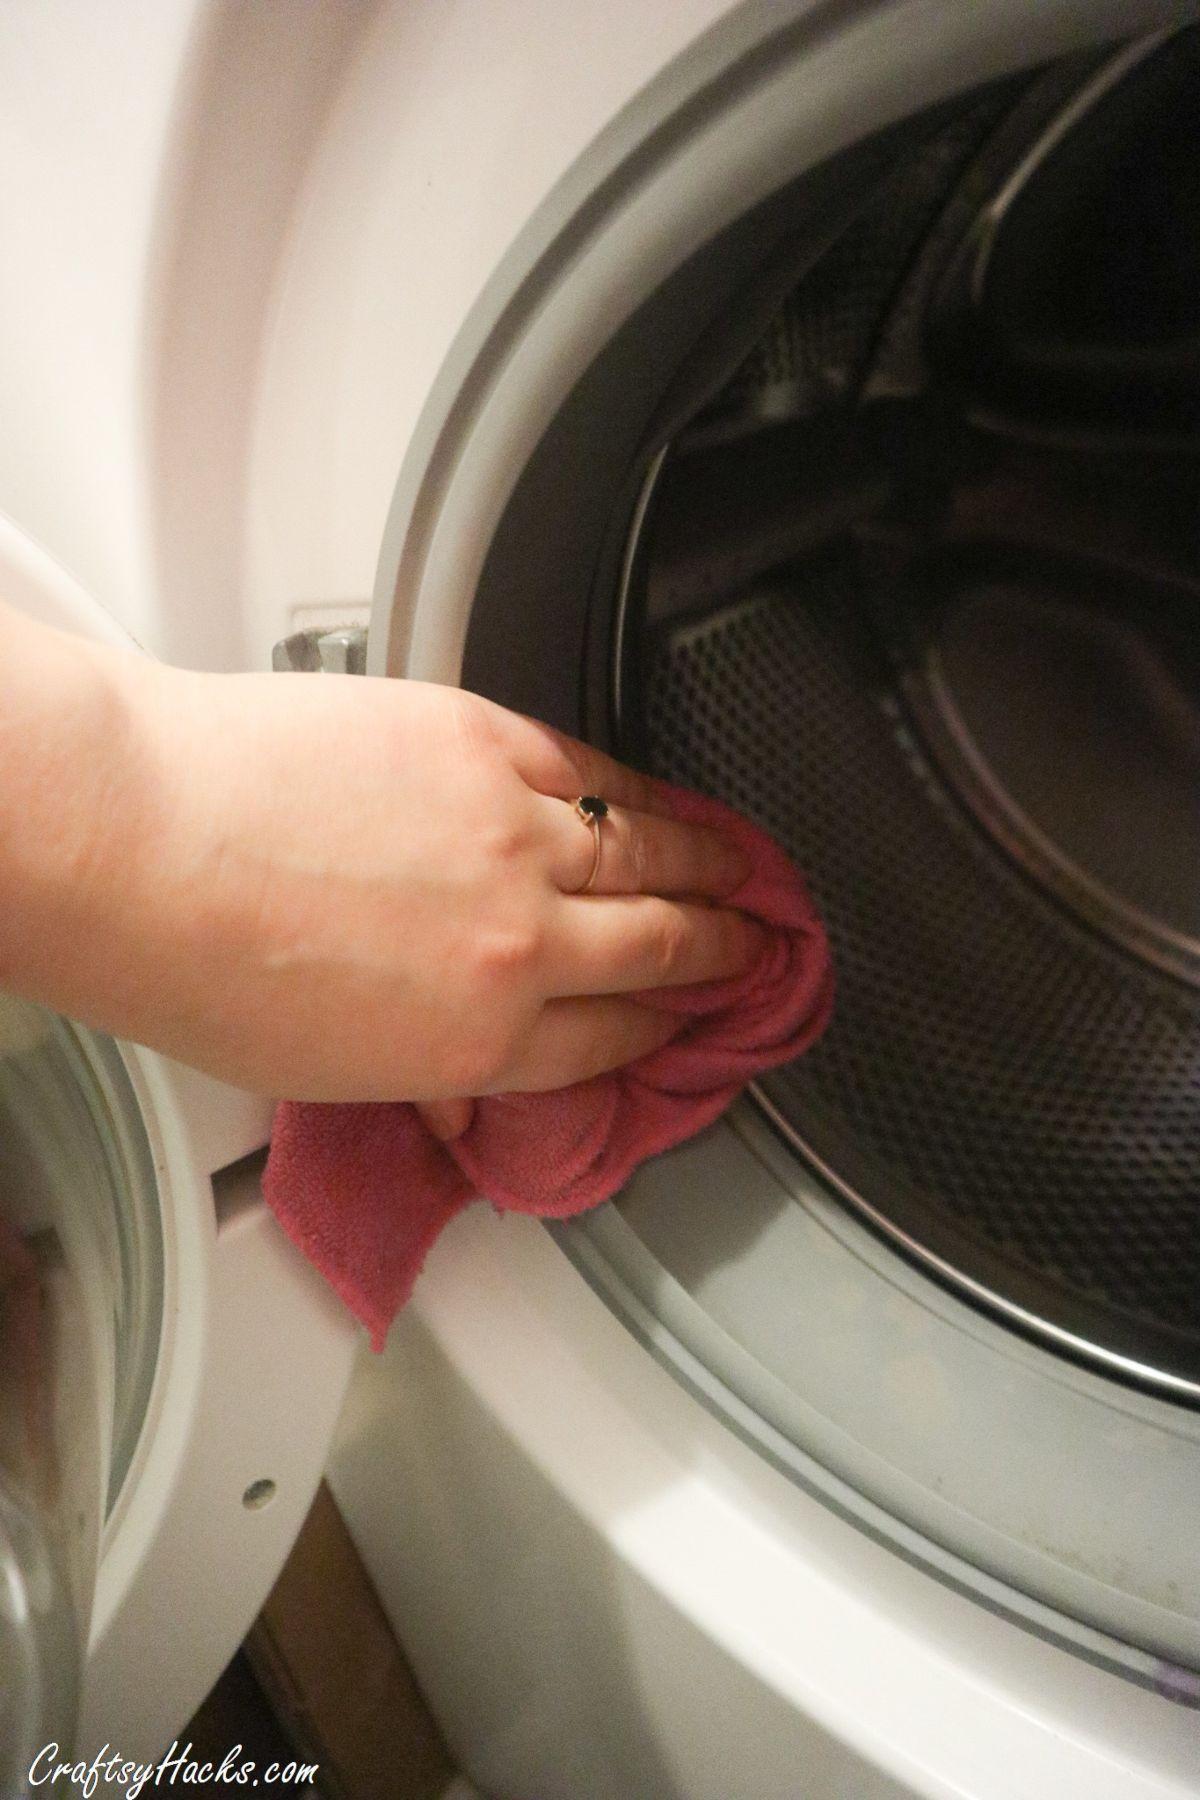 Keep Your Washing Machine Sparkling